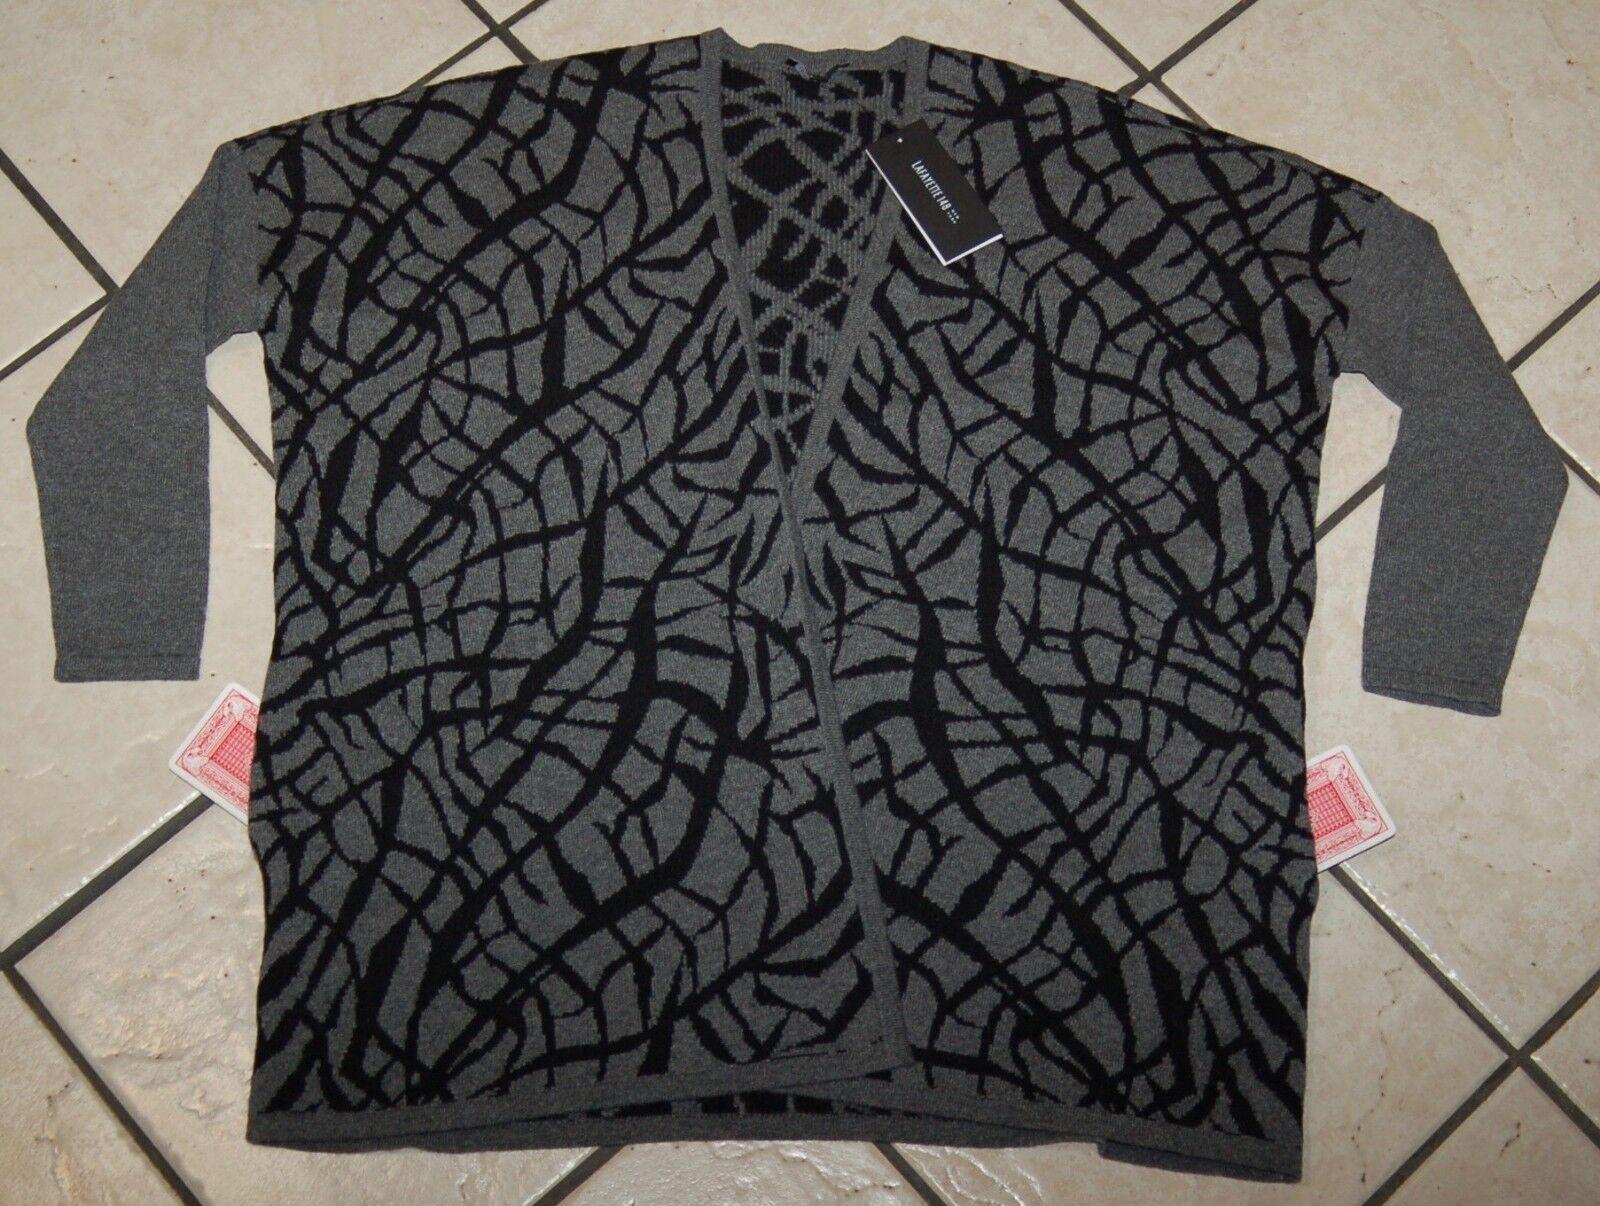 Lafayette 148 ny Woherrar Print bildigan tröja, Smoke Multi, Storlek S